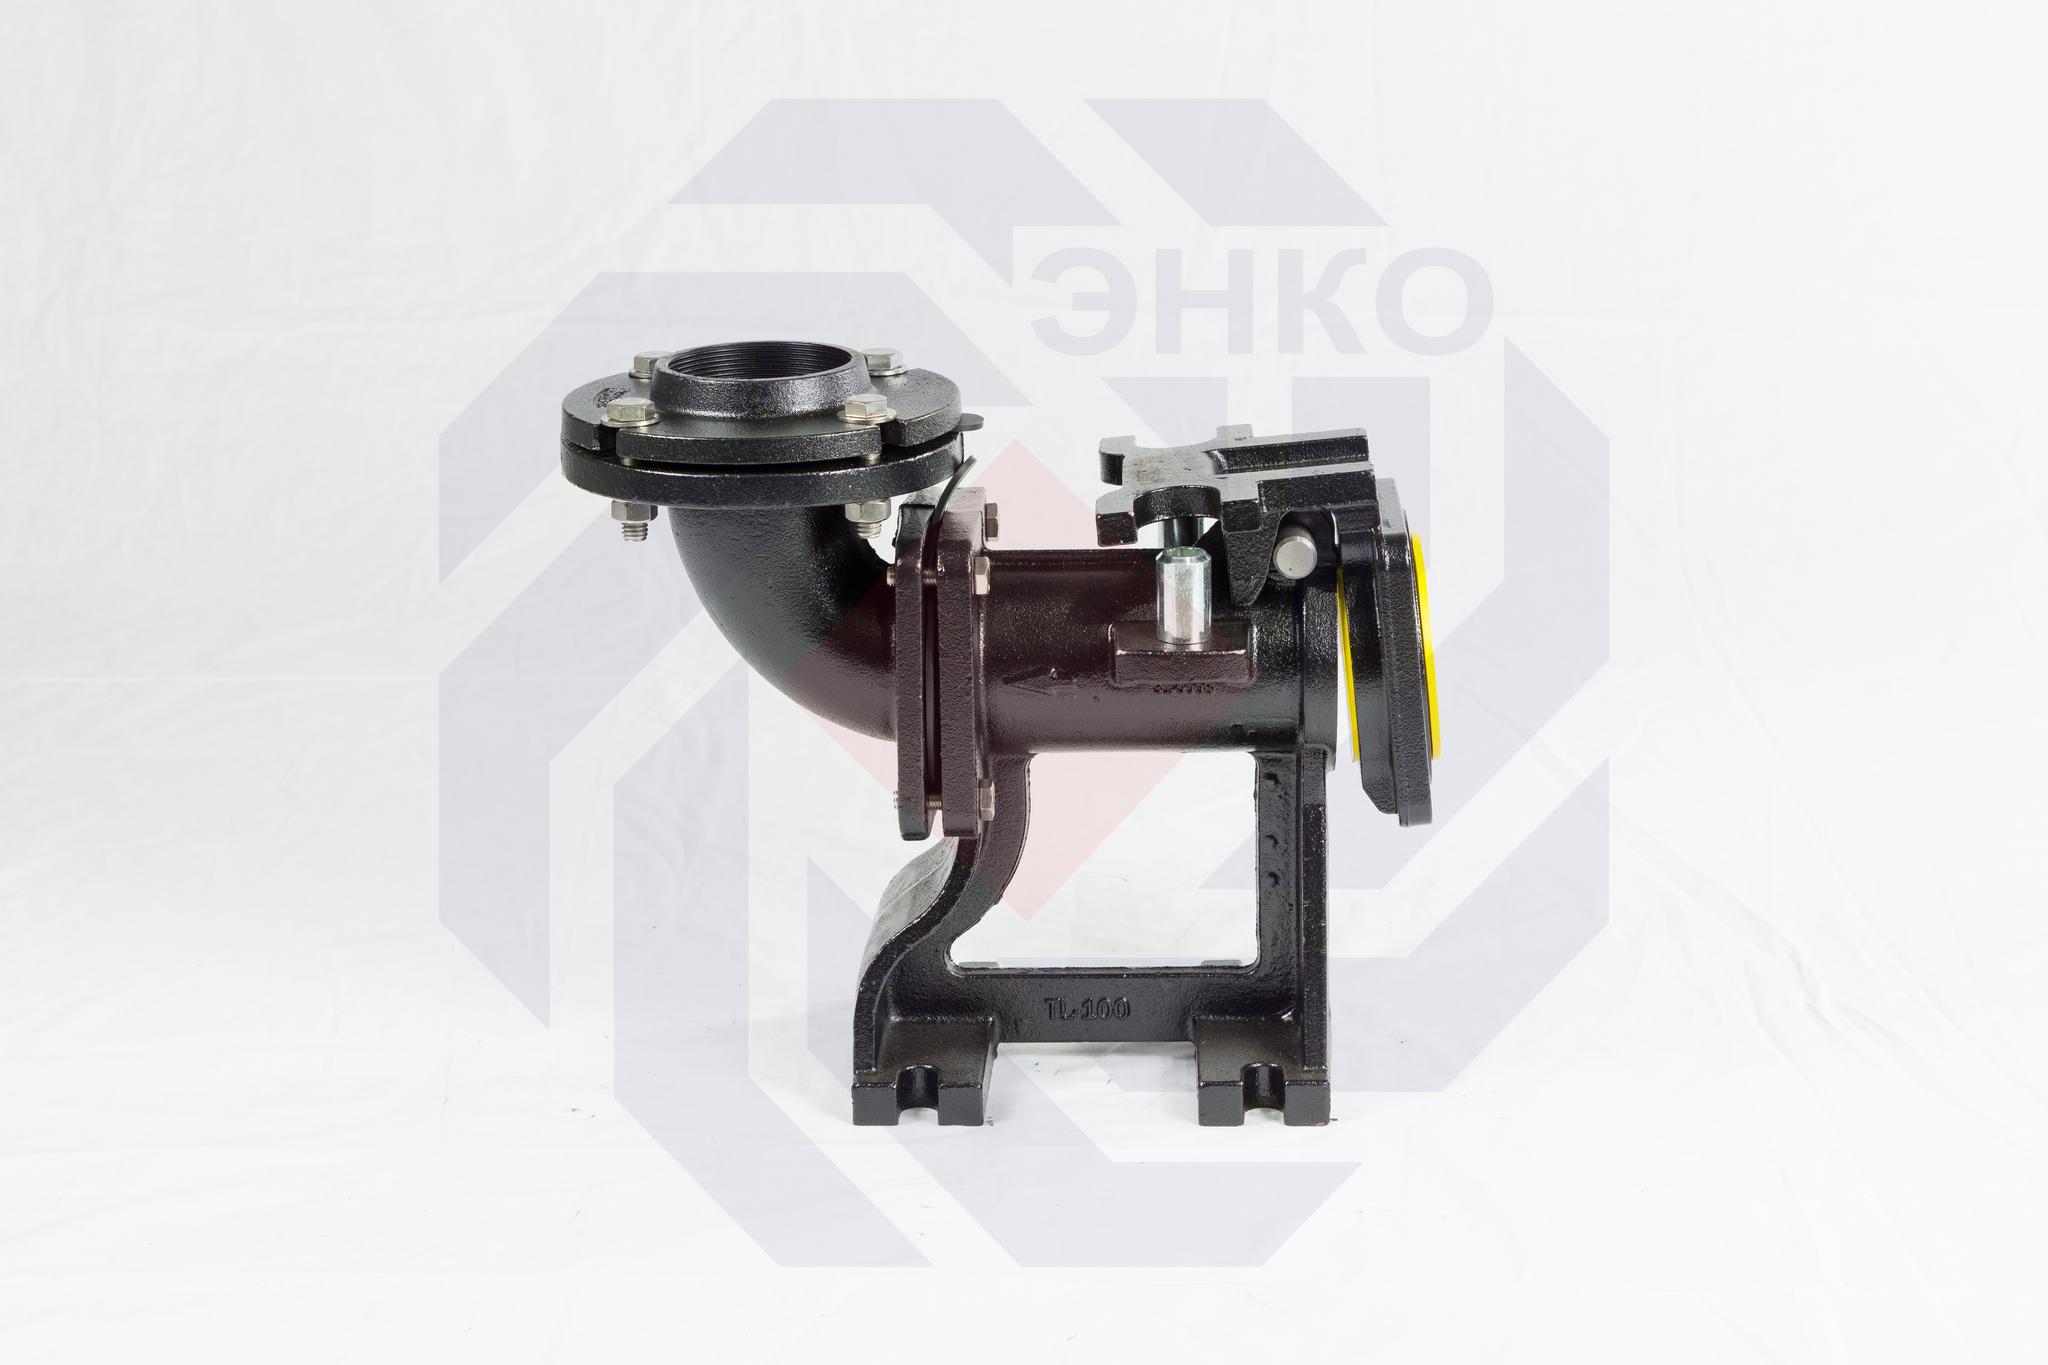 Комплект стационарной установки STAIRS TL-80